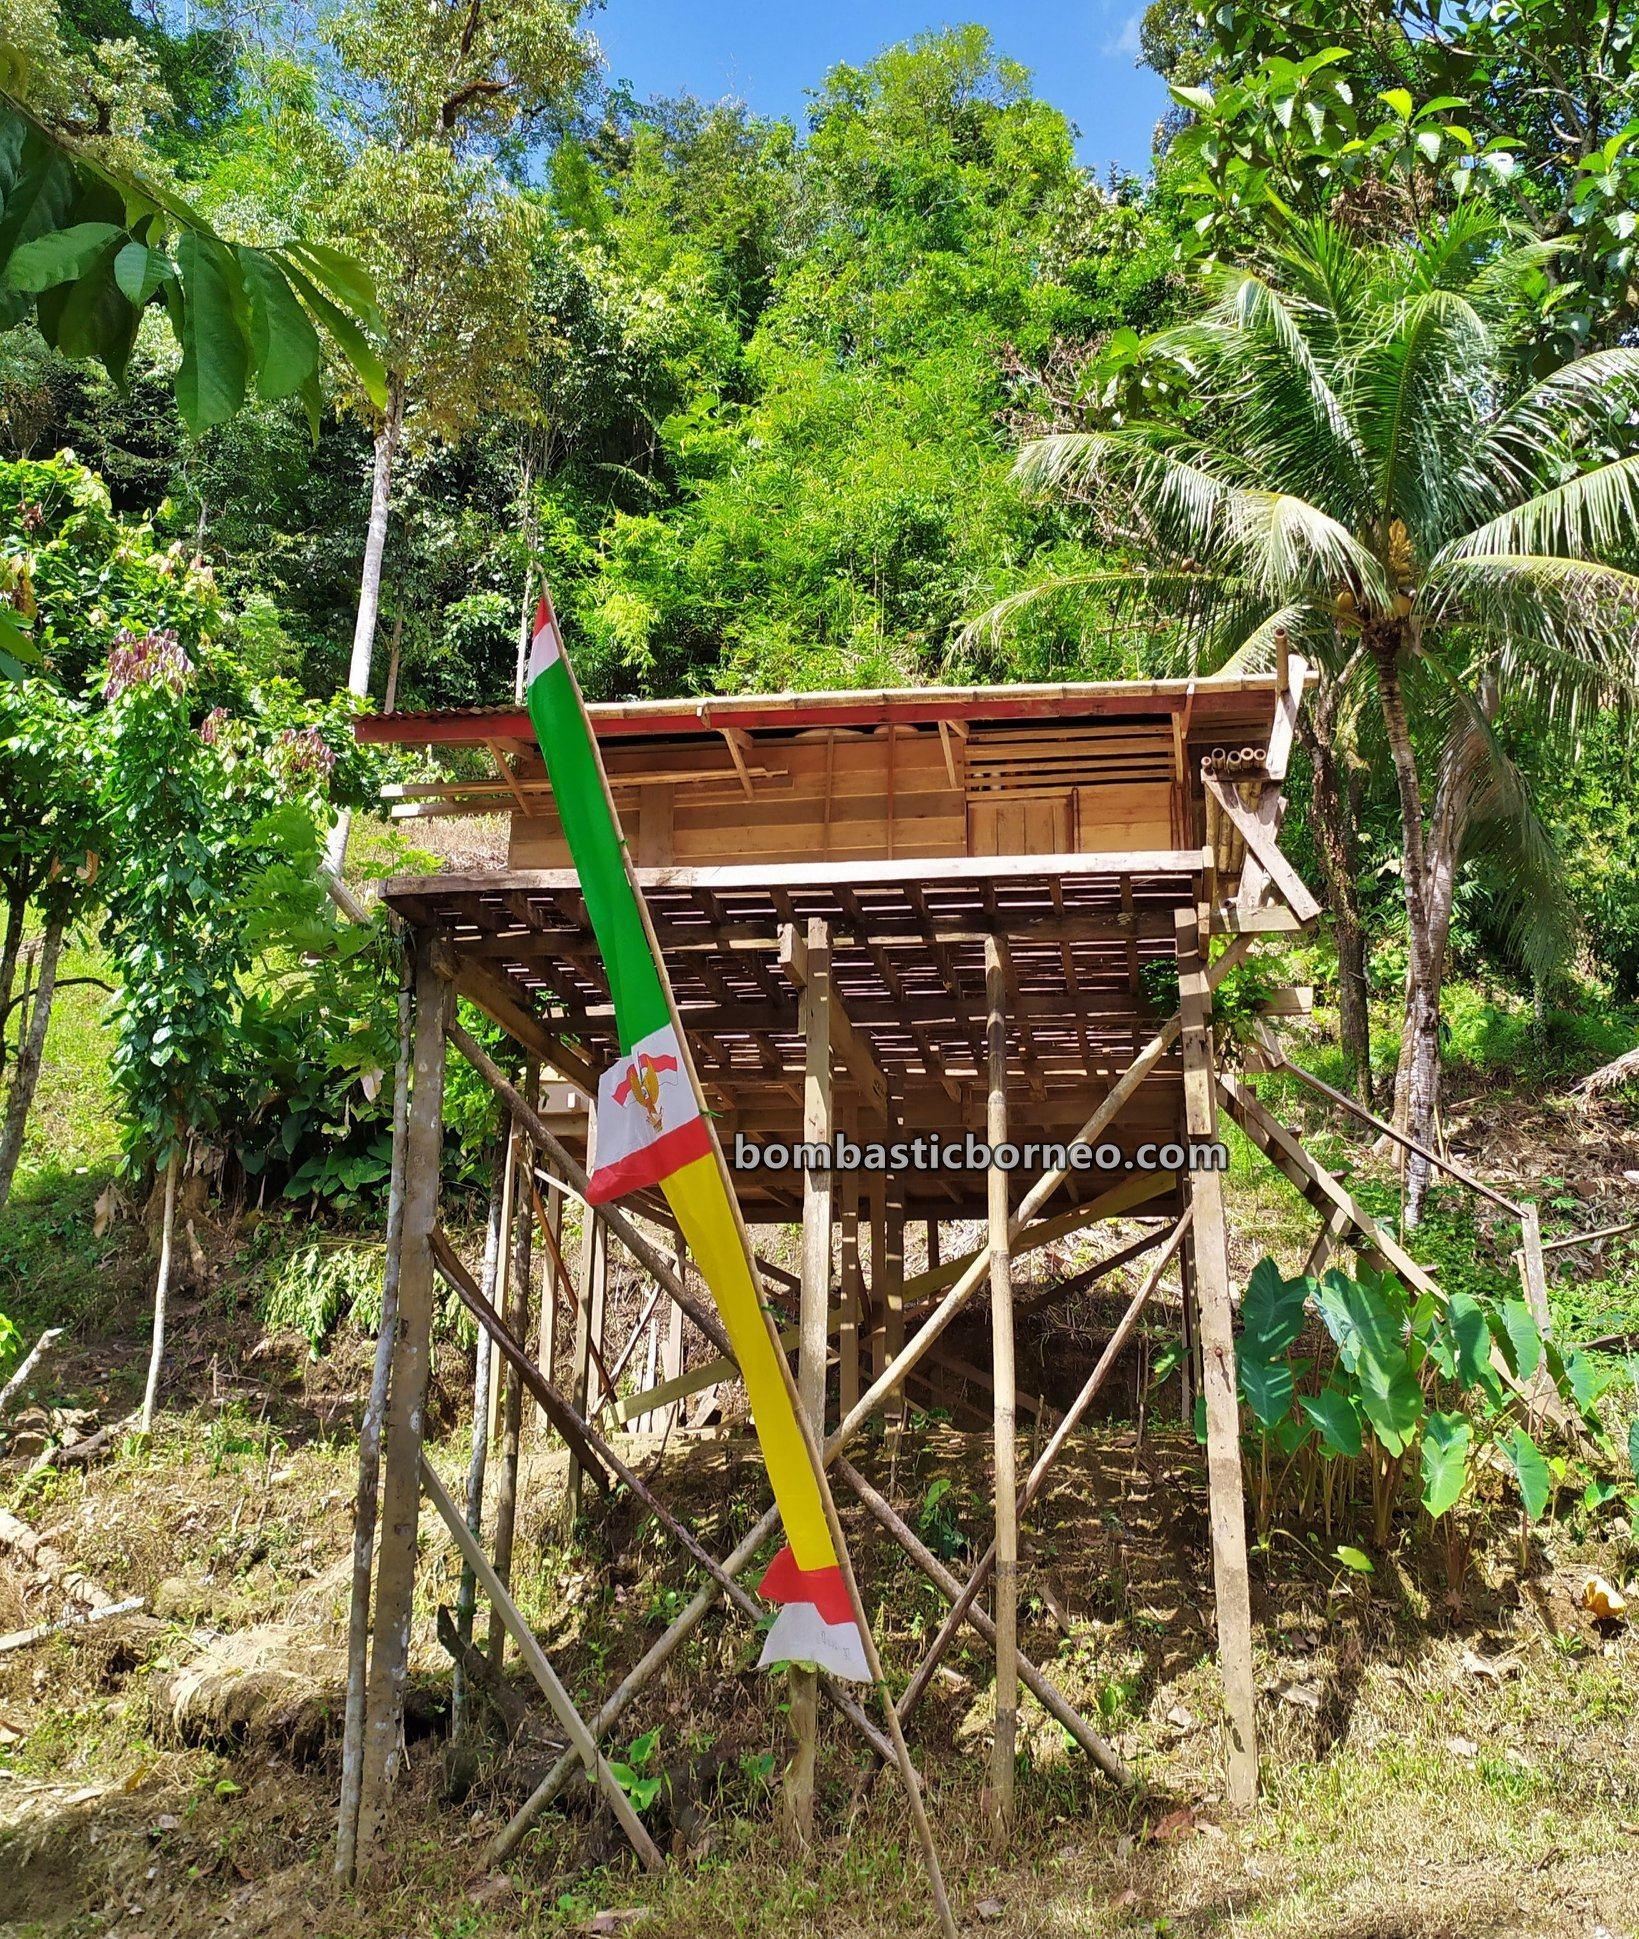 Dusun Medeng, authentic, traditional, destination, Bengkayang, Kalimantan Barat, Siding, Dayak Bidayuh, tribe, Gawai harvest festival, Tourism, Travel guide, Trans Border, 印尼西加里曼丹, 原住民土著部落